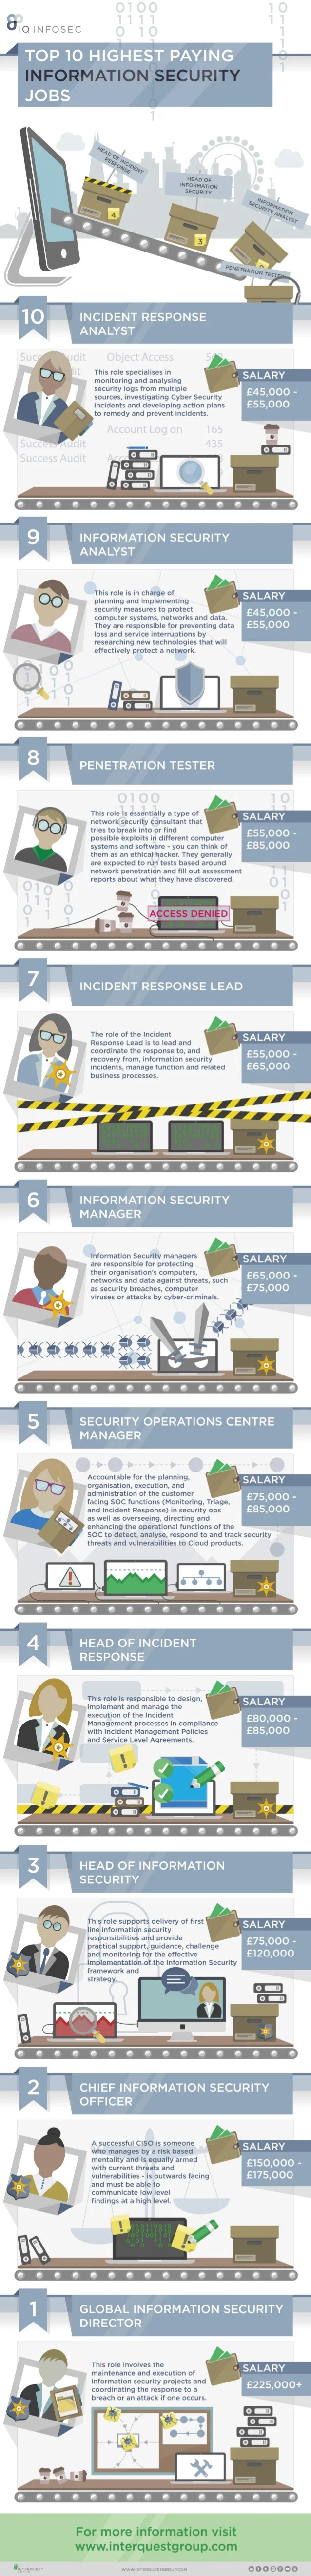 Top Security Jobs